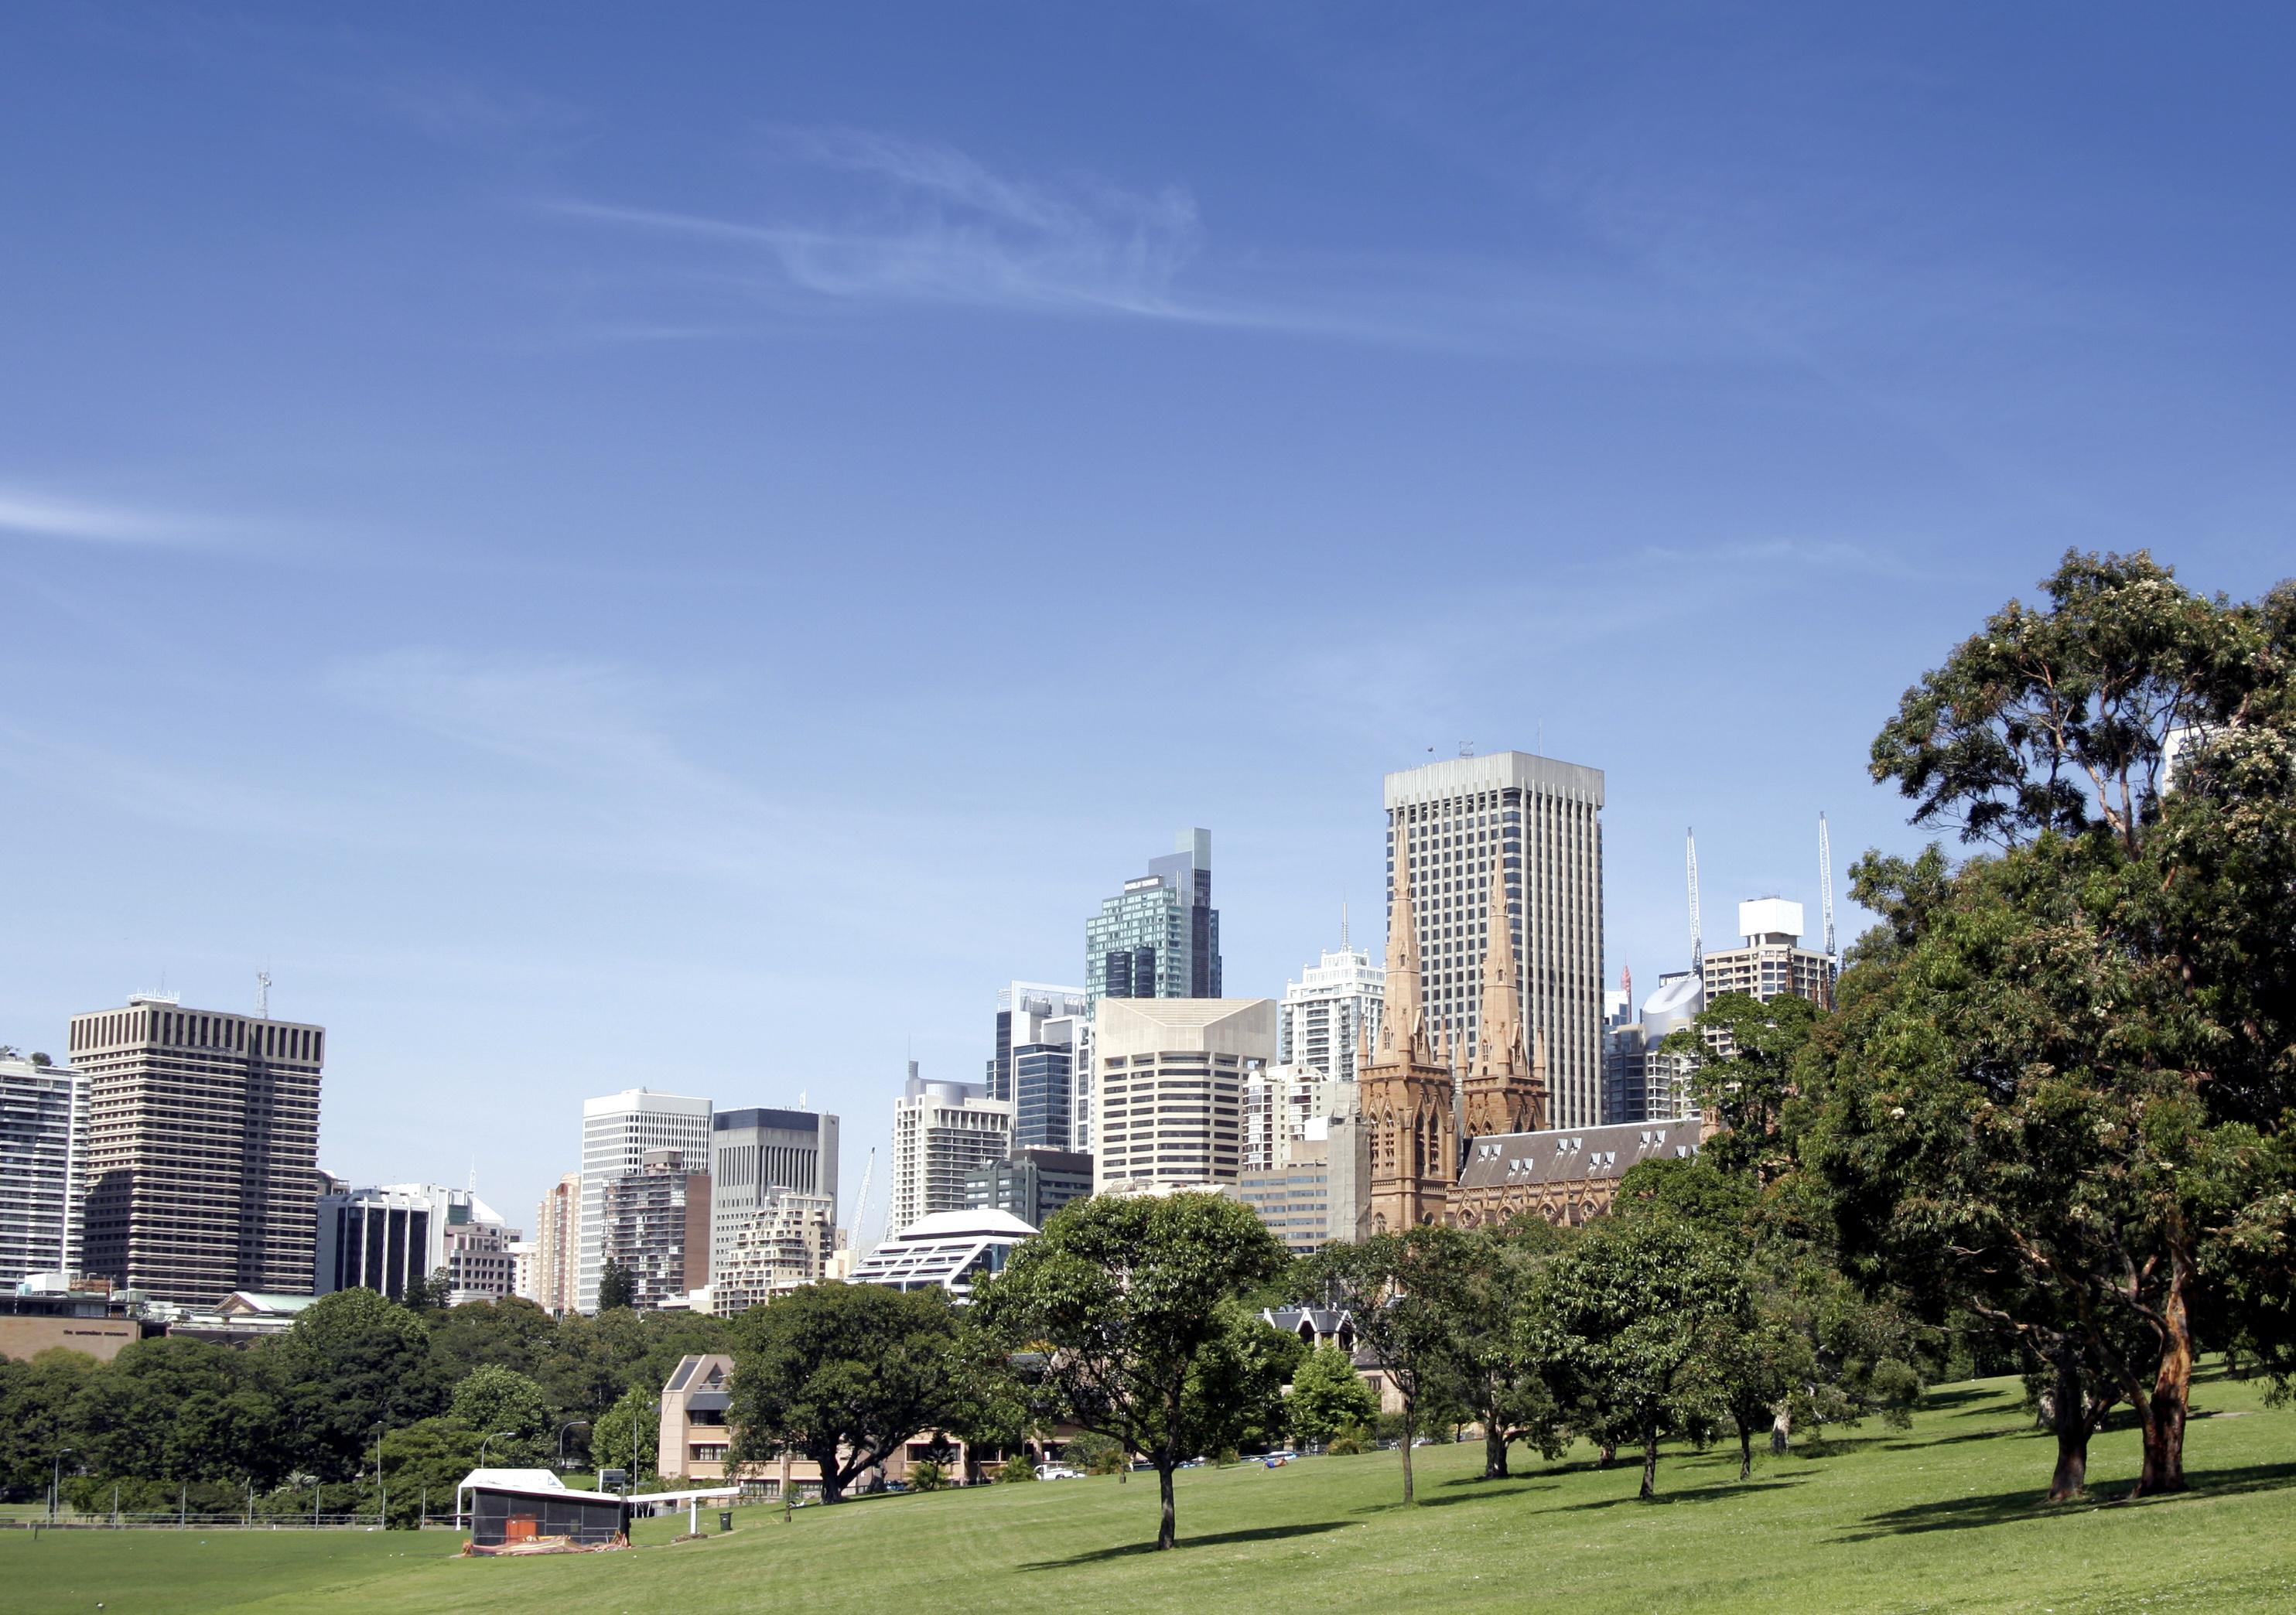 Urban Public Park In Front Of Tall City Office Buildings, Sydney, Australia